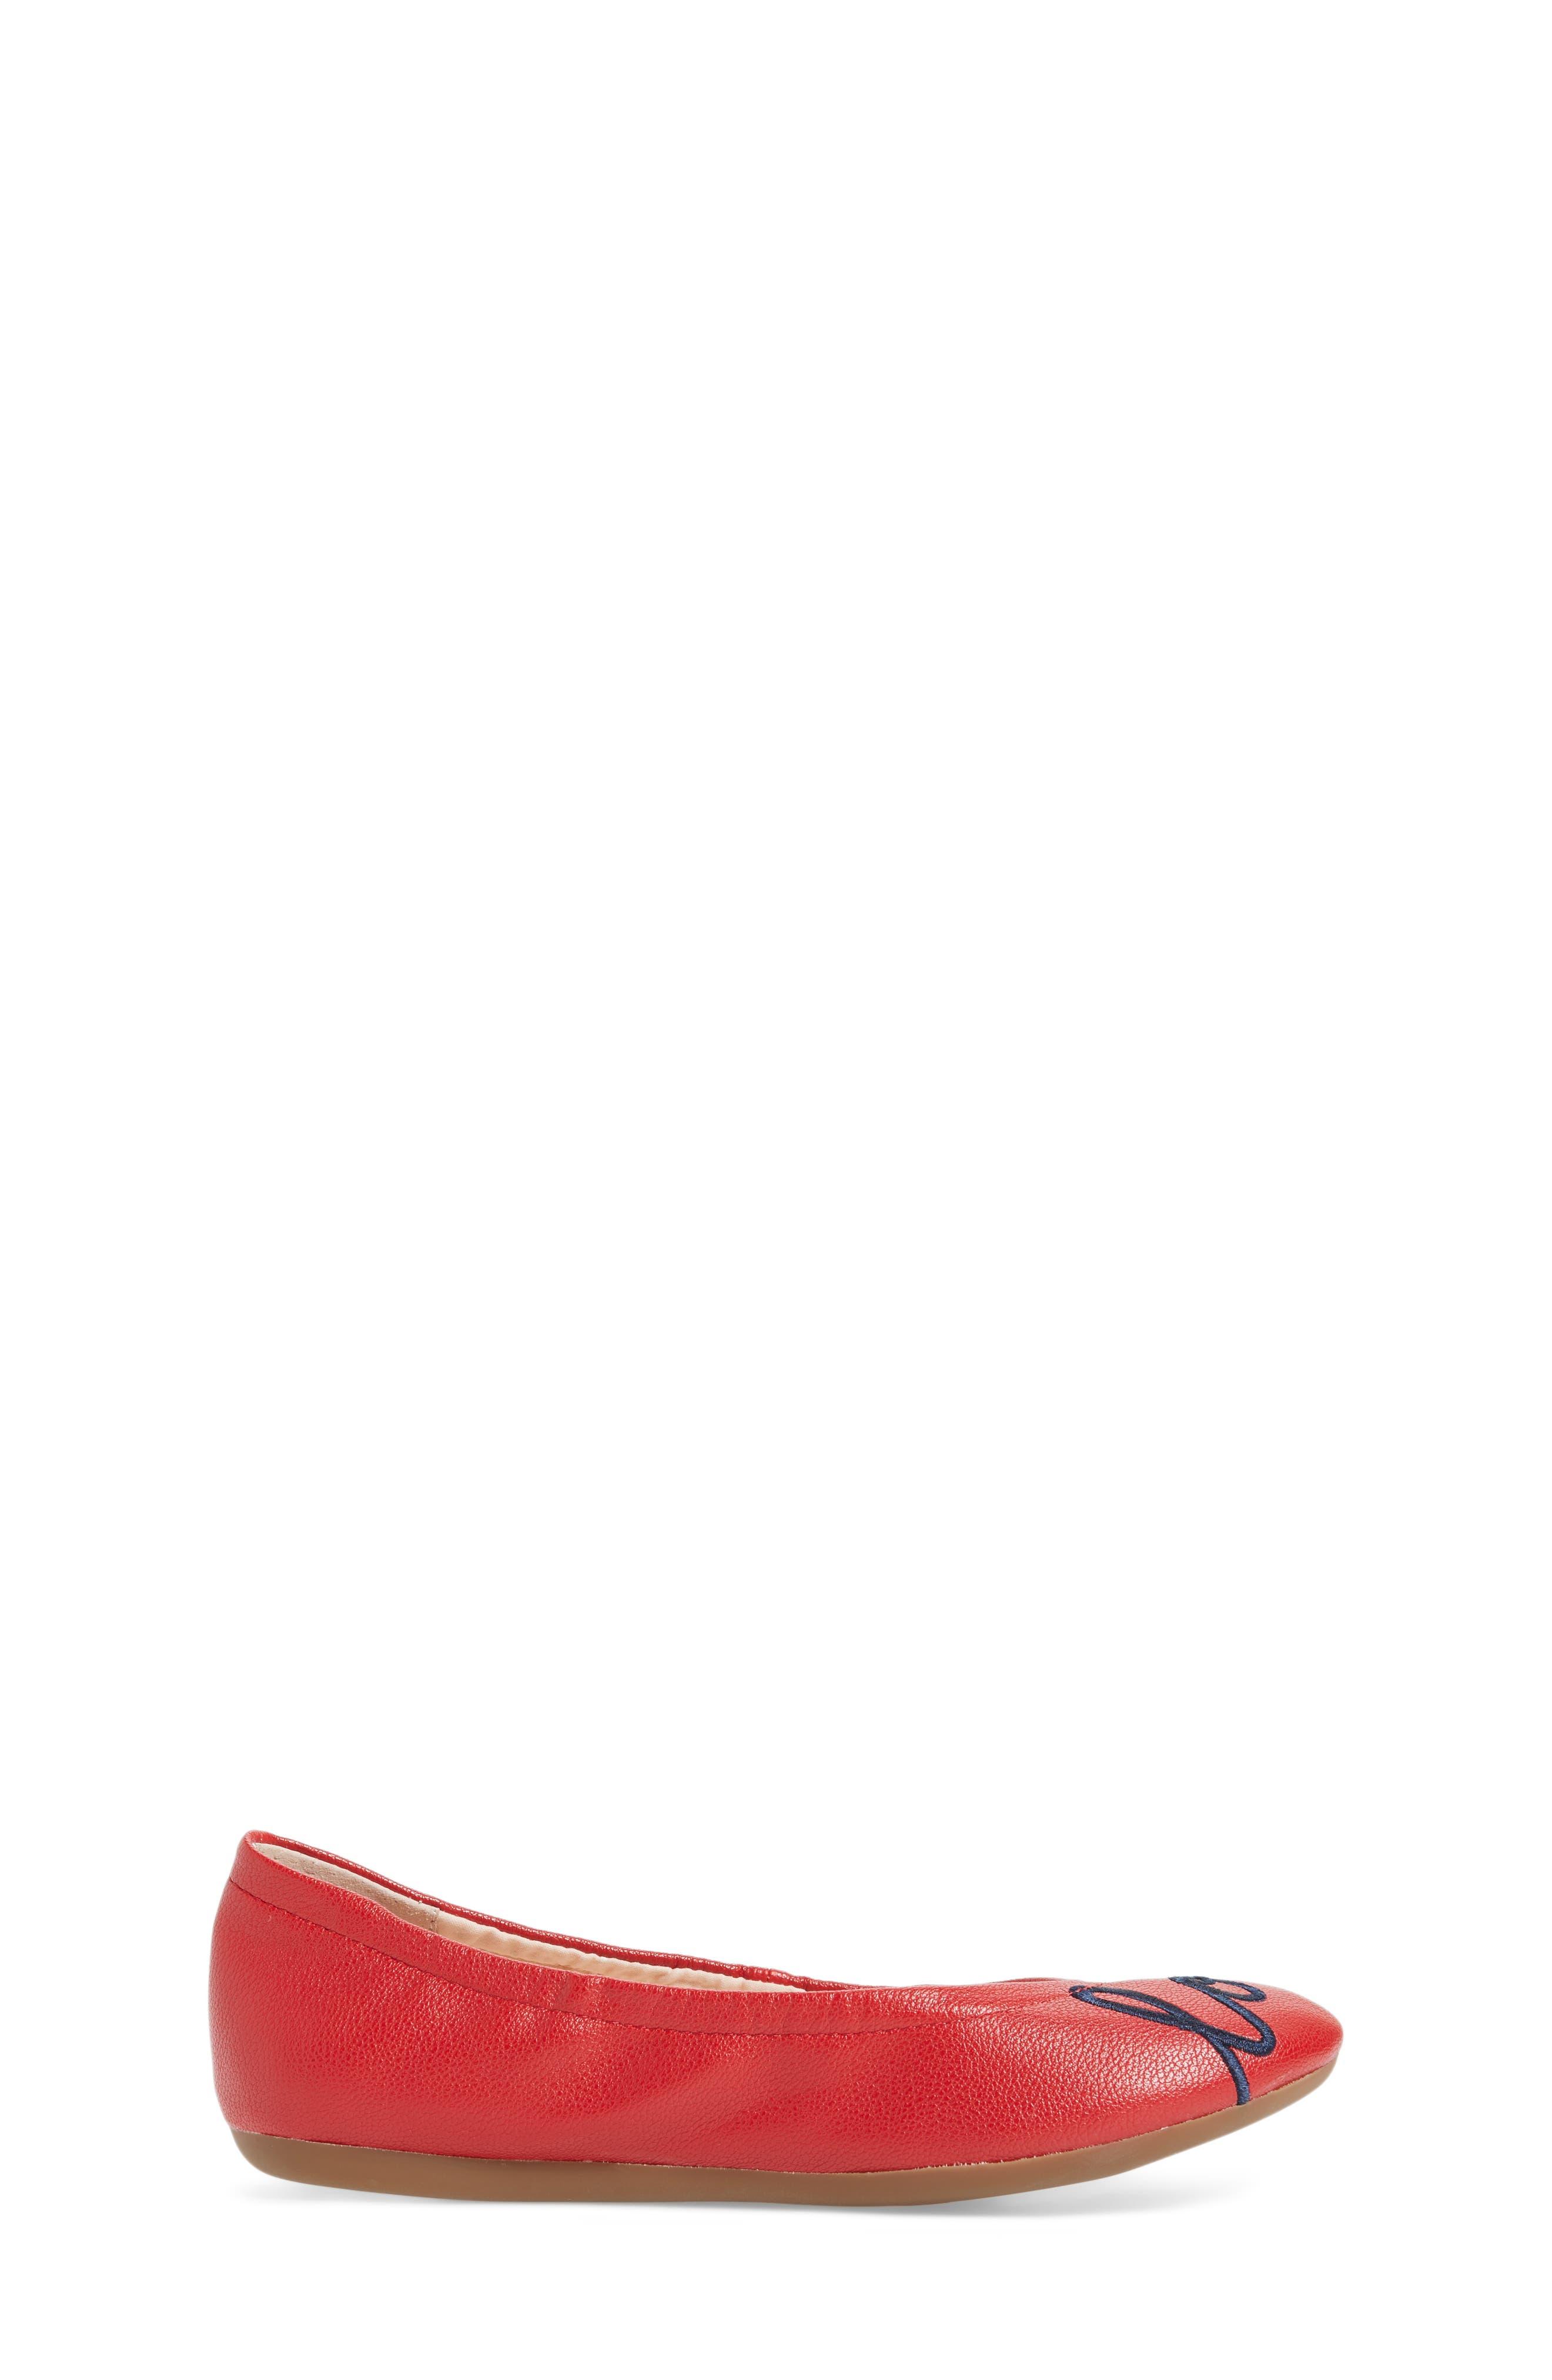 Langlee Embroidered Ballet Flat,                             Alternate thumbnail 3, color,                             SALSA